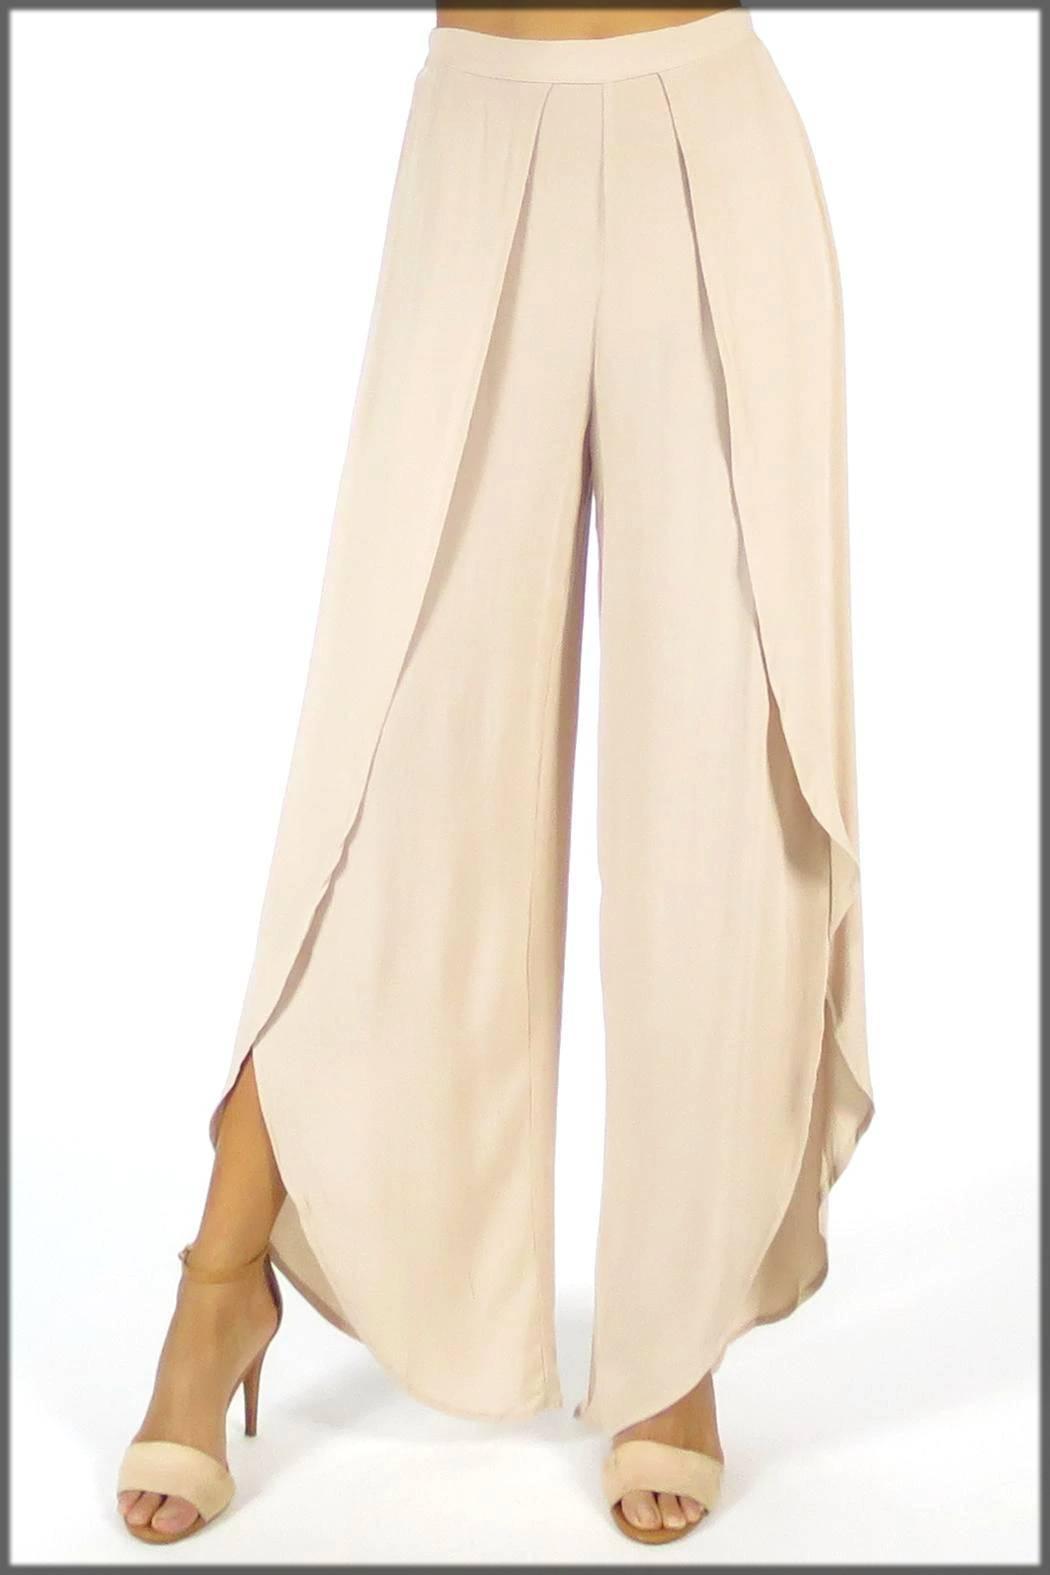 stylish and comfortable tulip pants